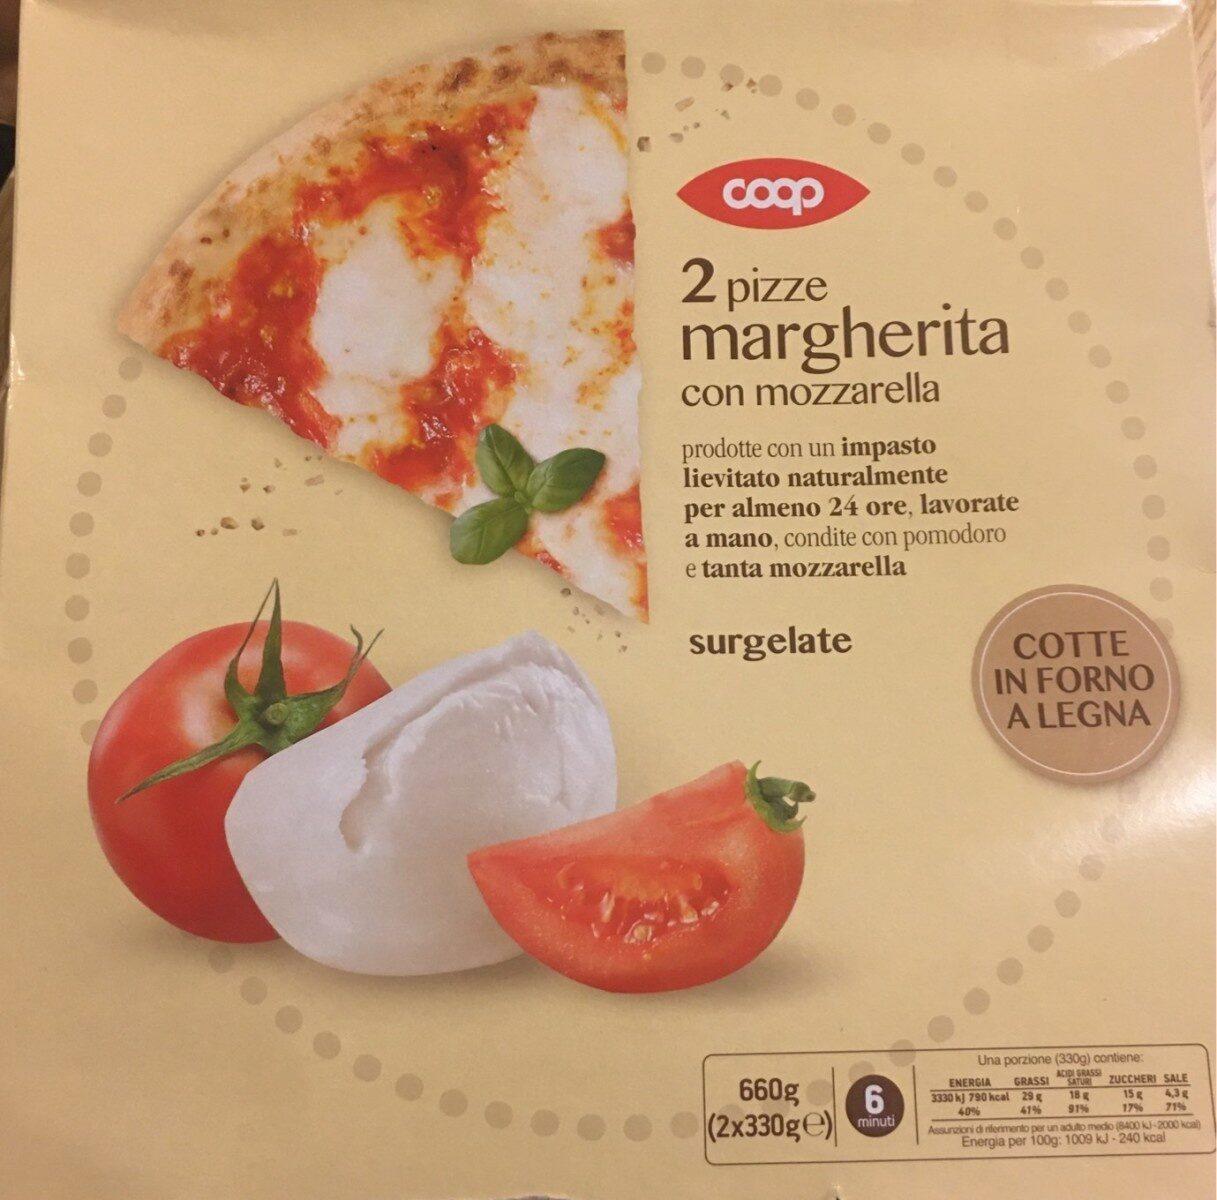 Pizze margherita con mozzarella - Product